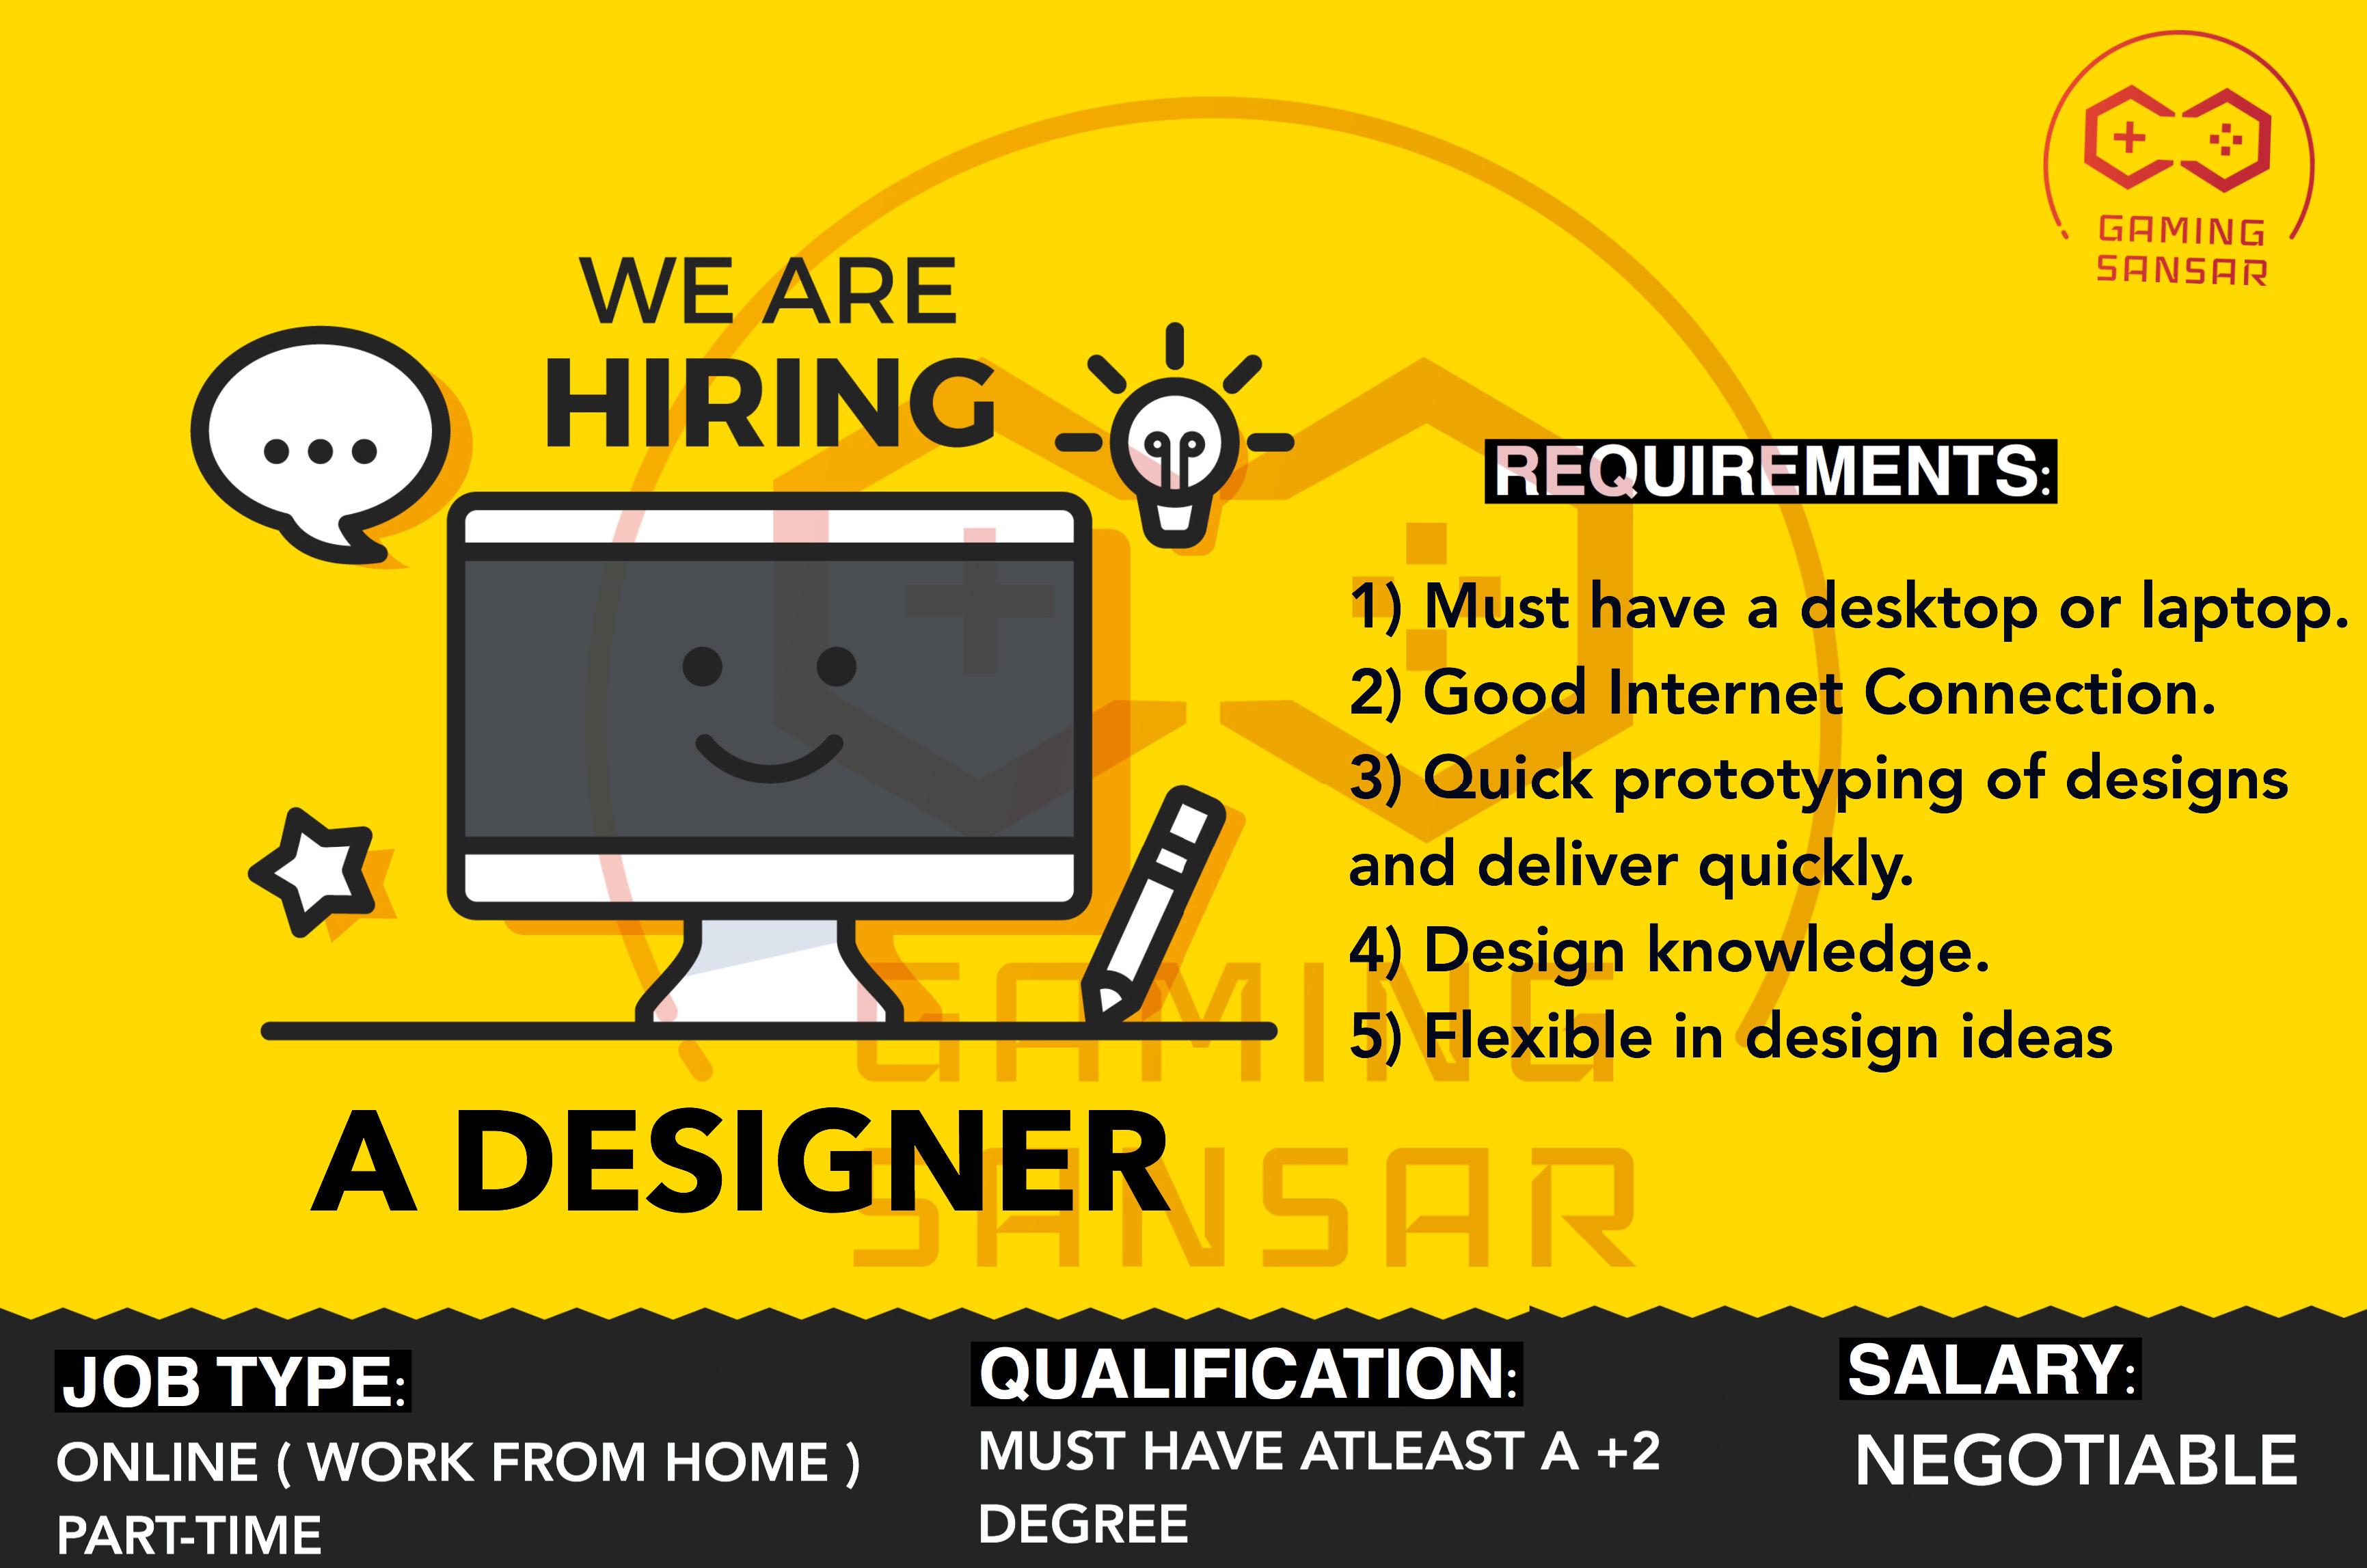 We are hiring a Designer